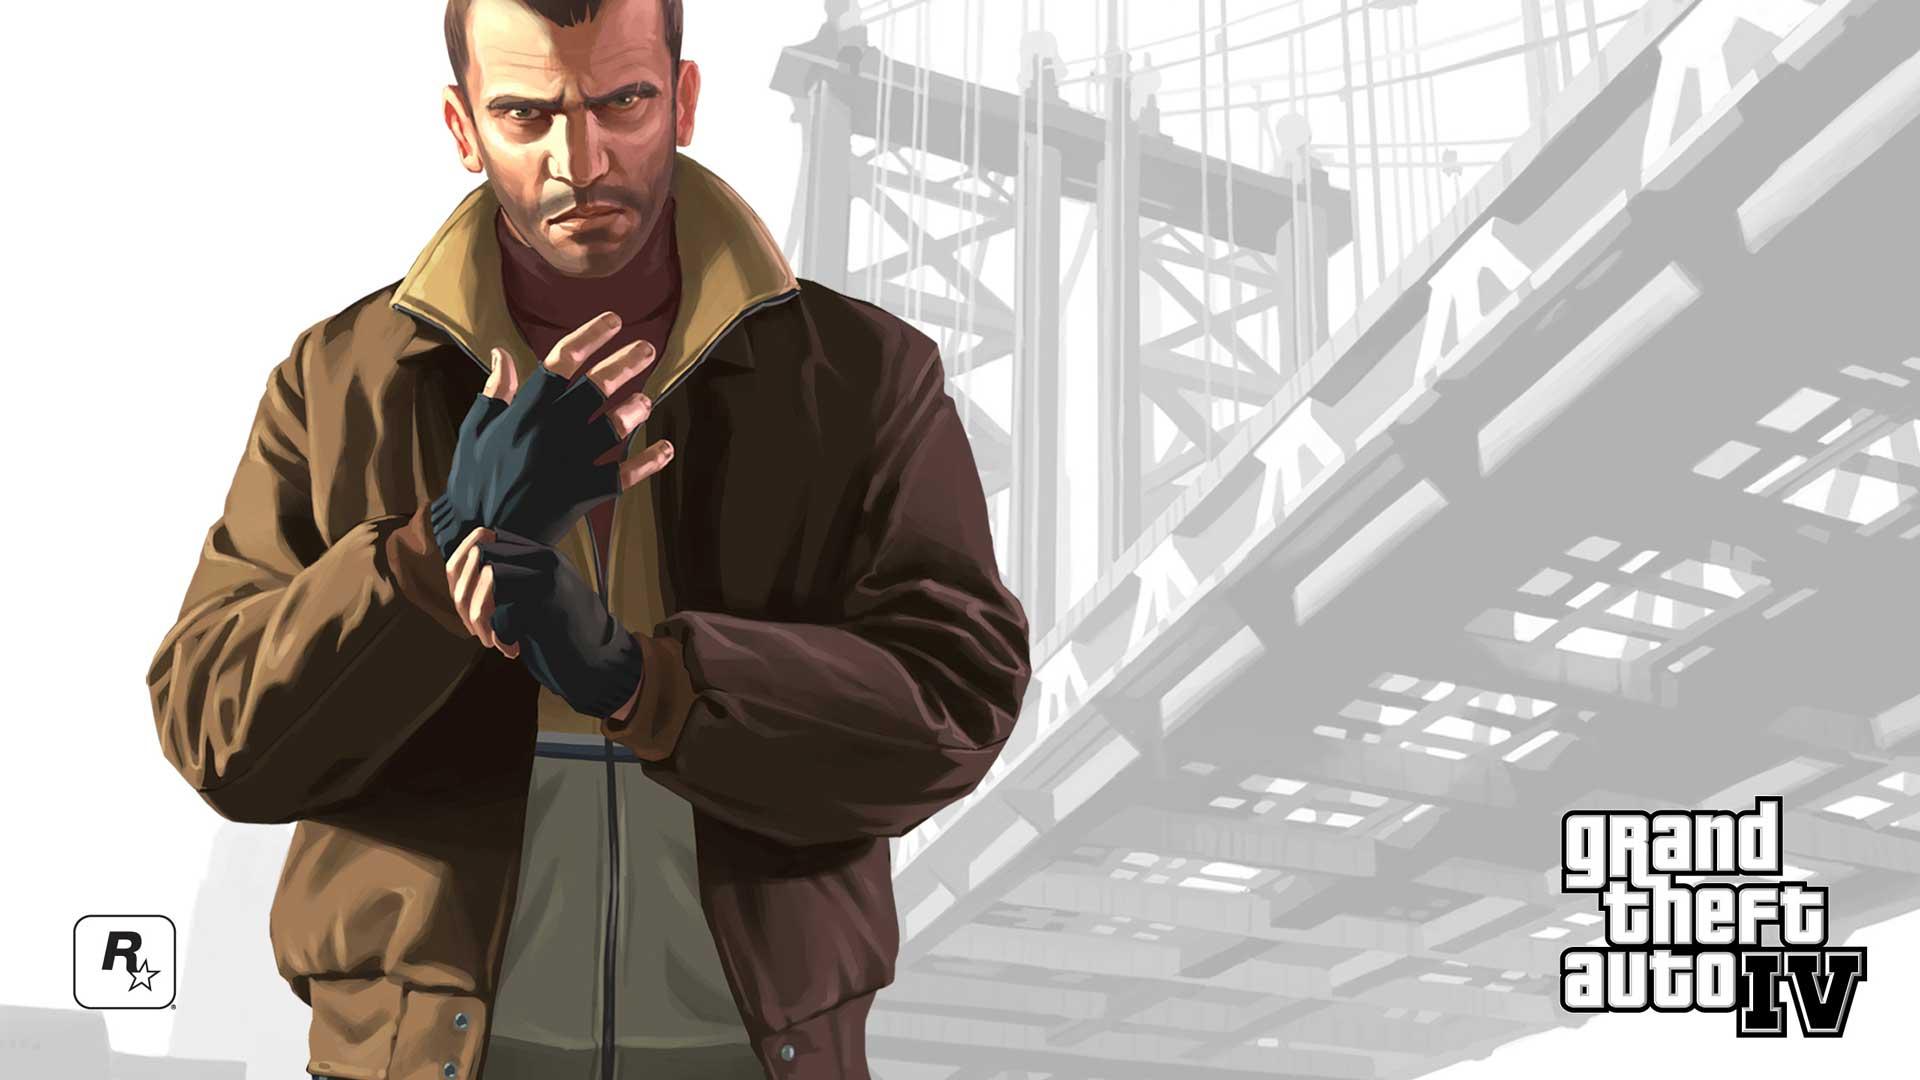 Grand Theft Auto IV / GTA IV Video